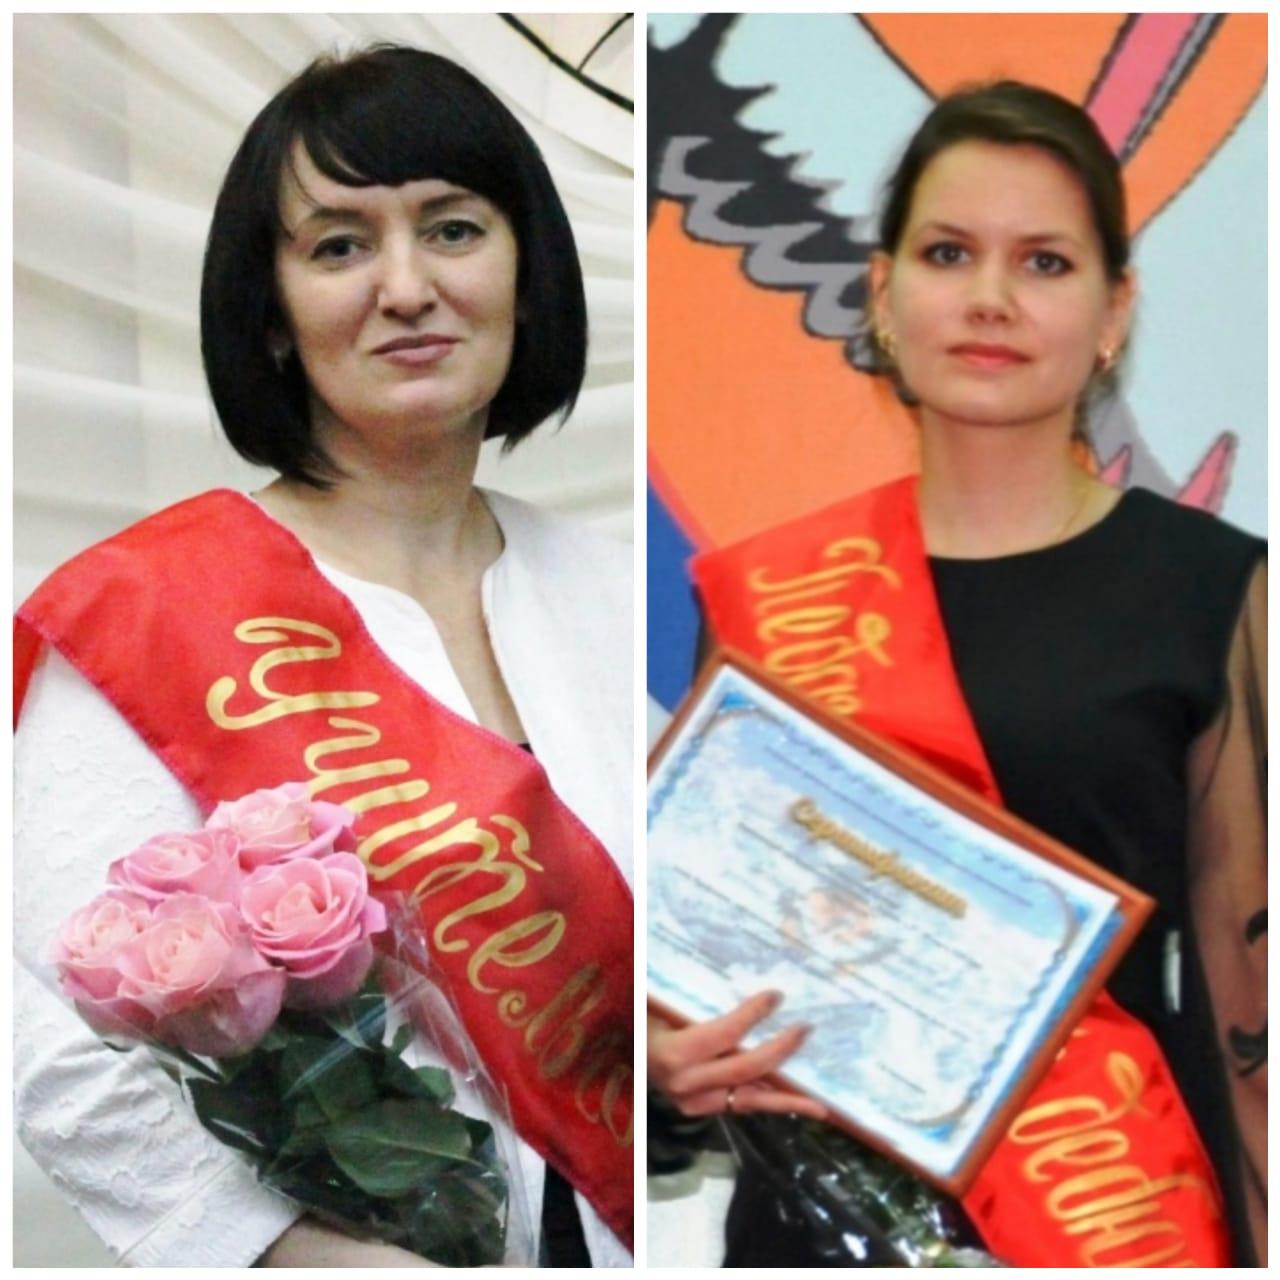 Педагоги Егорлыкского района – на конкурсе «Учитель года»